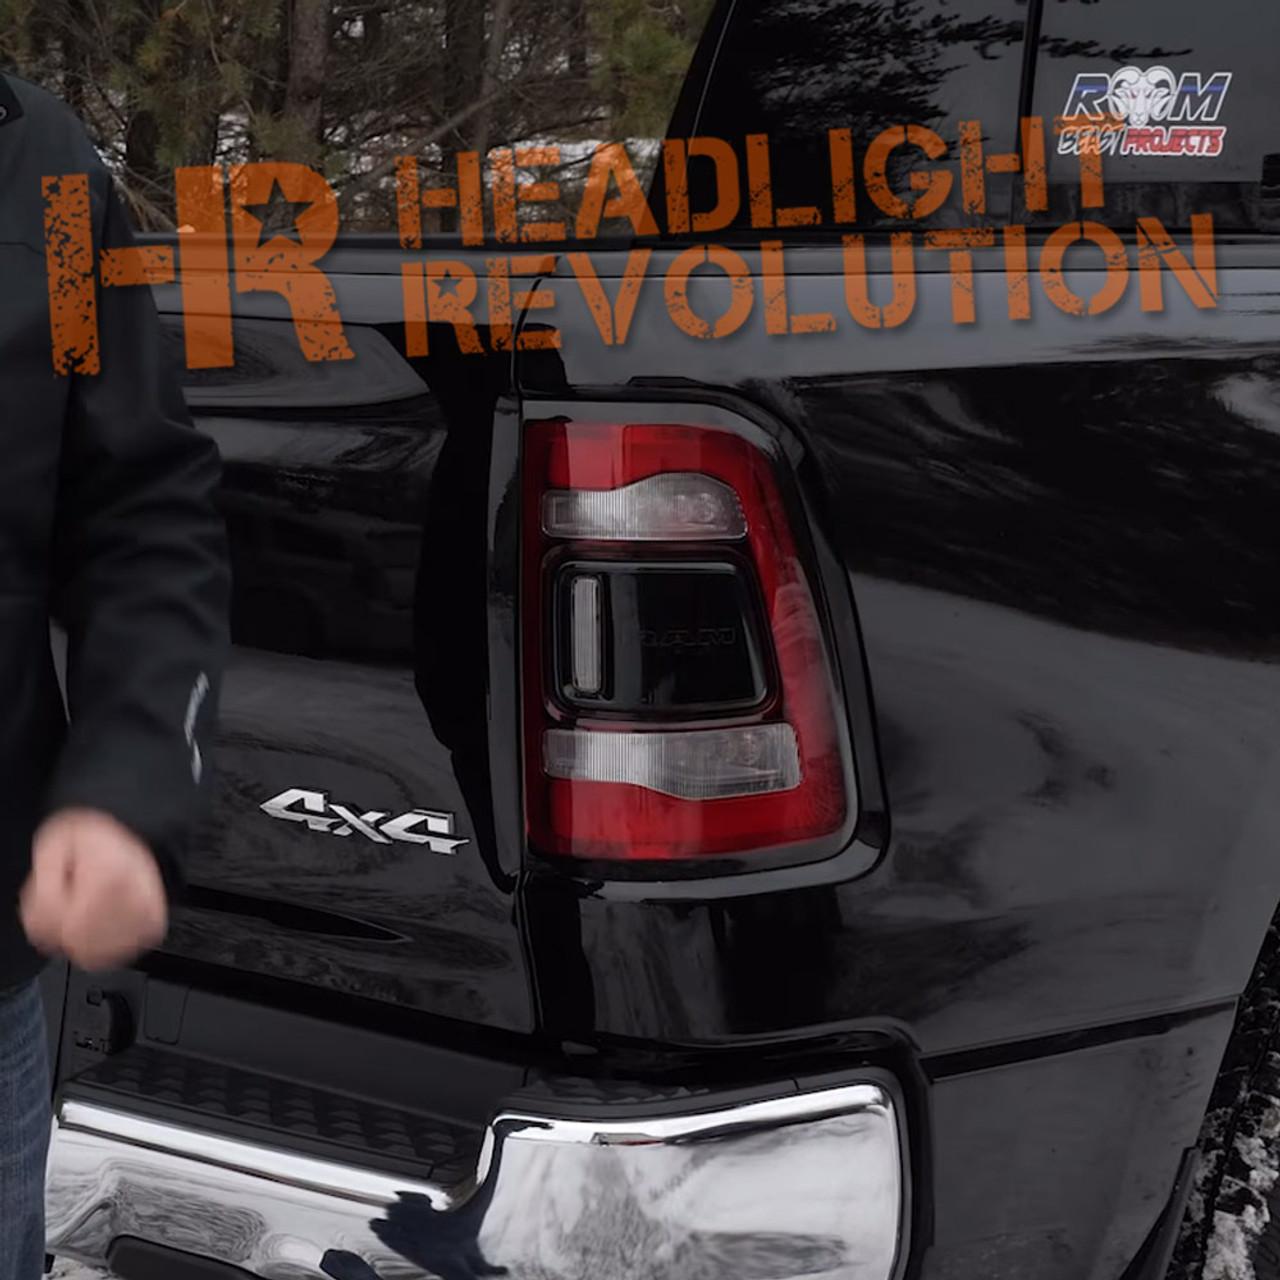 2019 Ram 1500 Oem Led Tail Lights